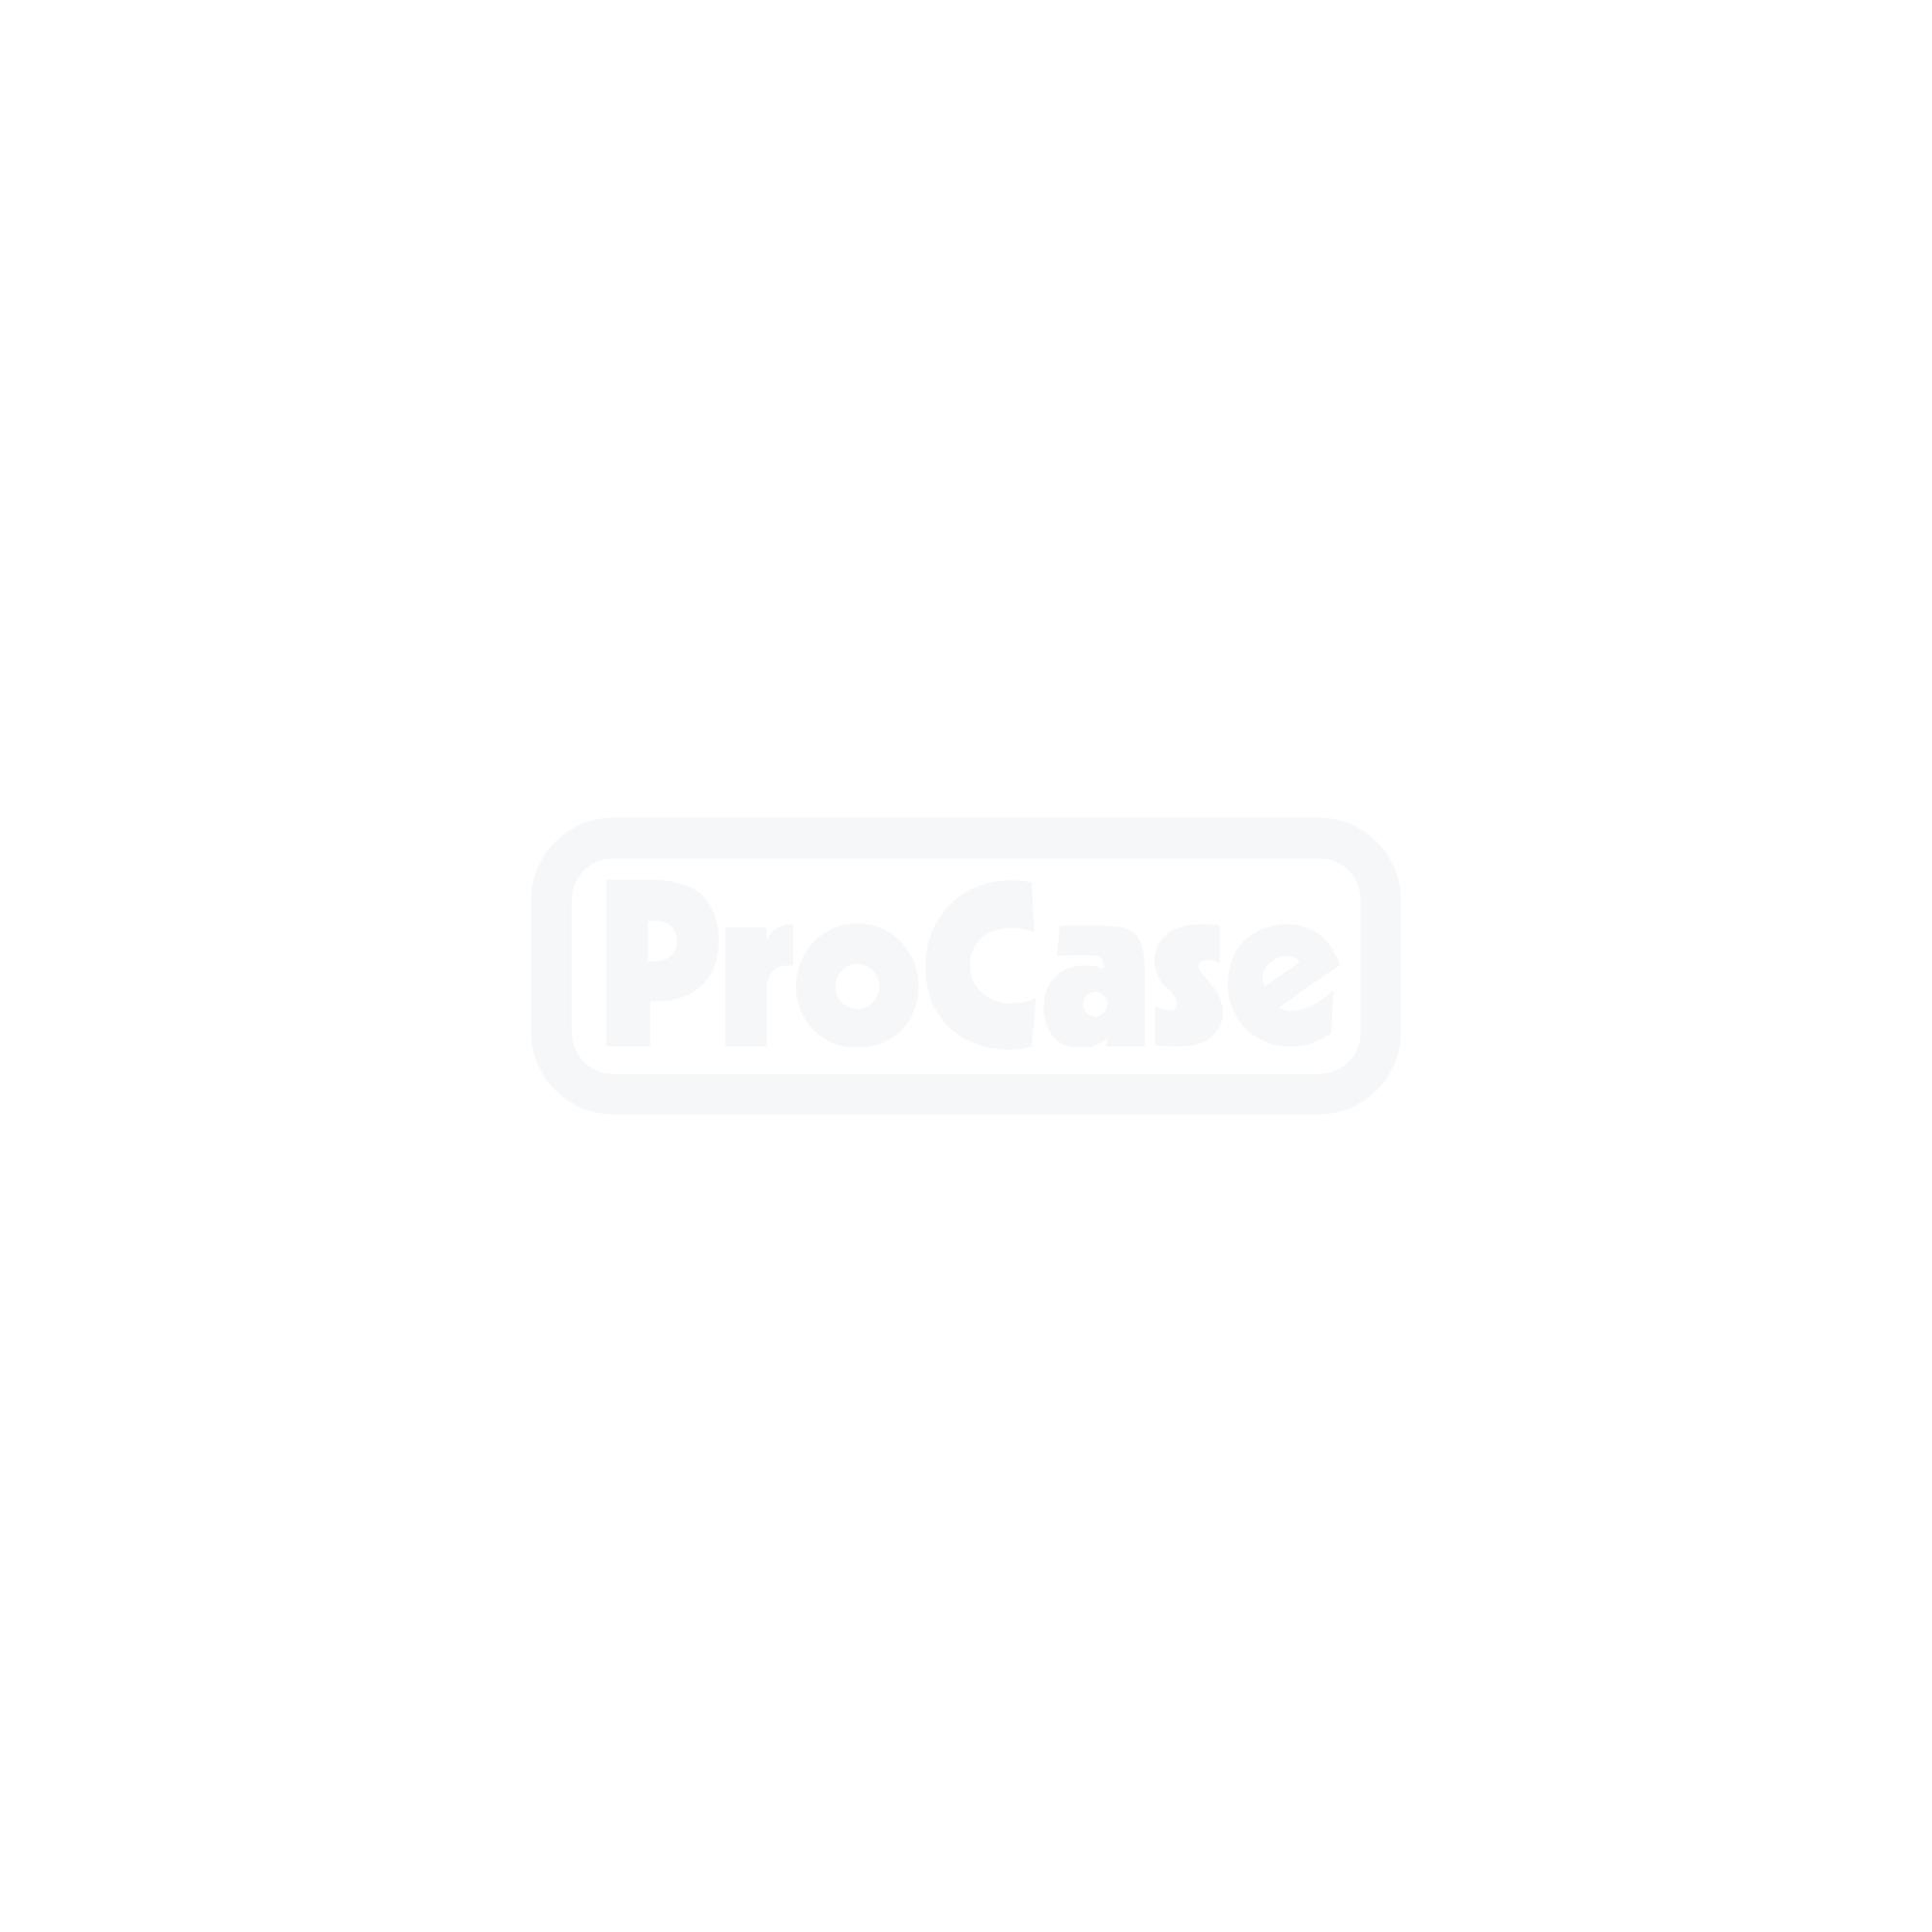 Flightcase für Dallmayr Riva Pronto S Kaffeevollautomat 2